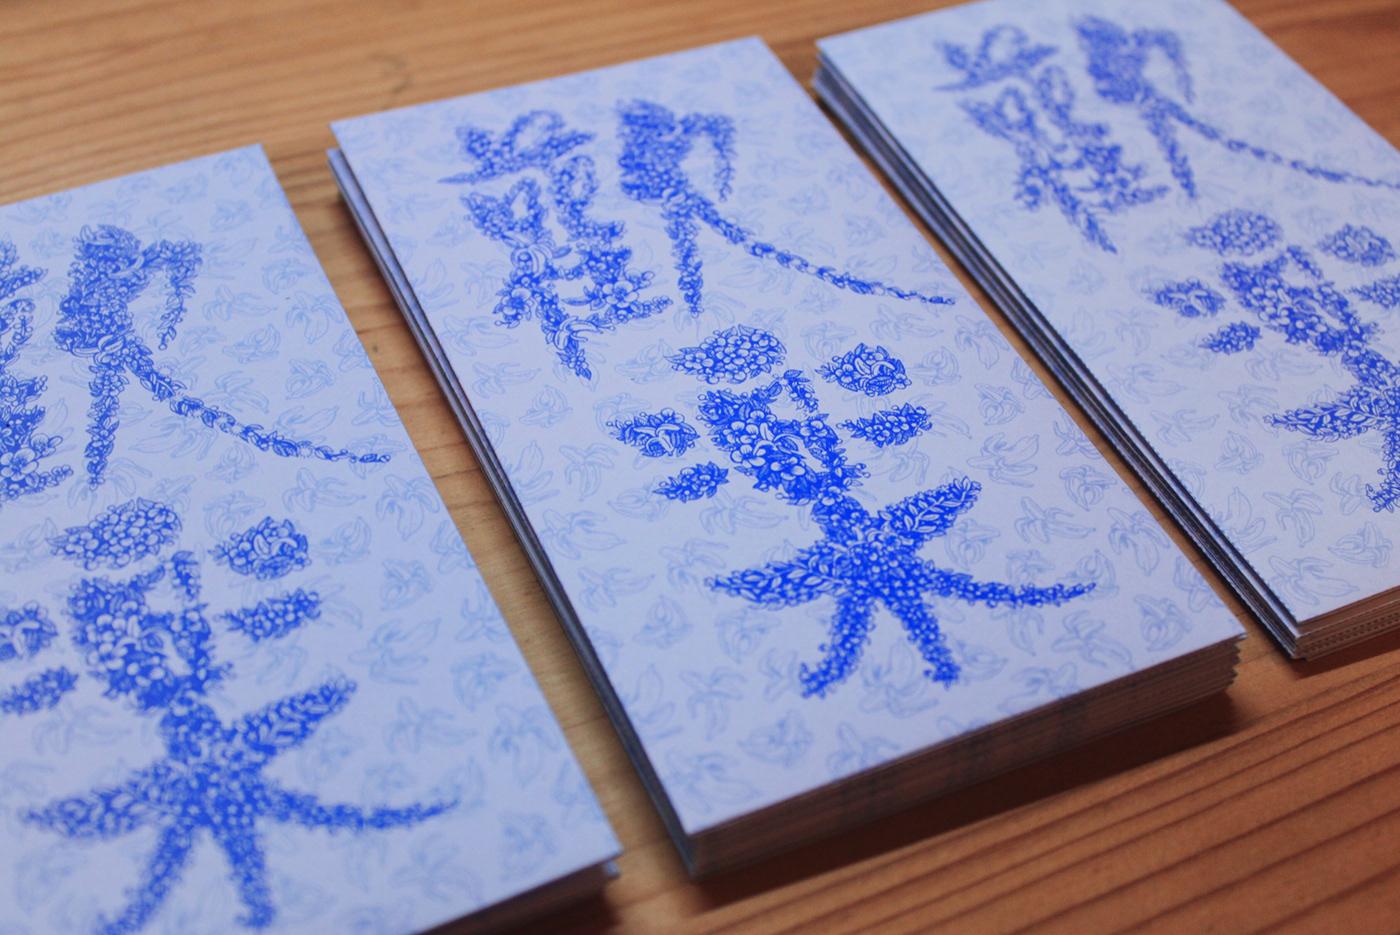 Calligraphy   chinese cny hongbao ILLUSTRATION  mandarin angpao chinese new year Lunar New Year red packets